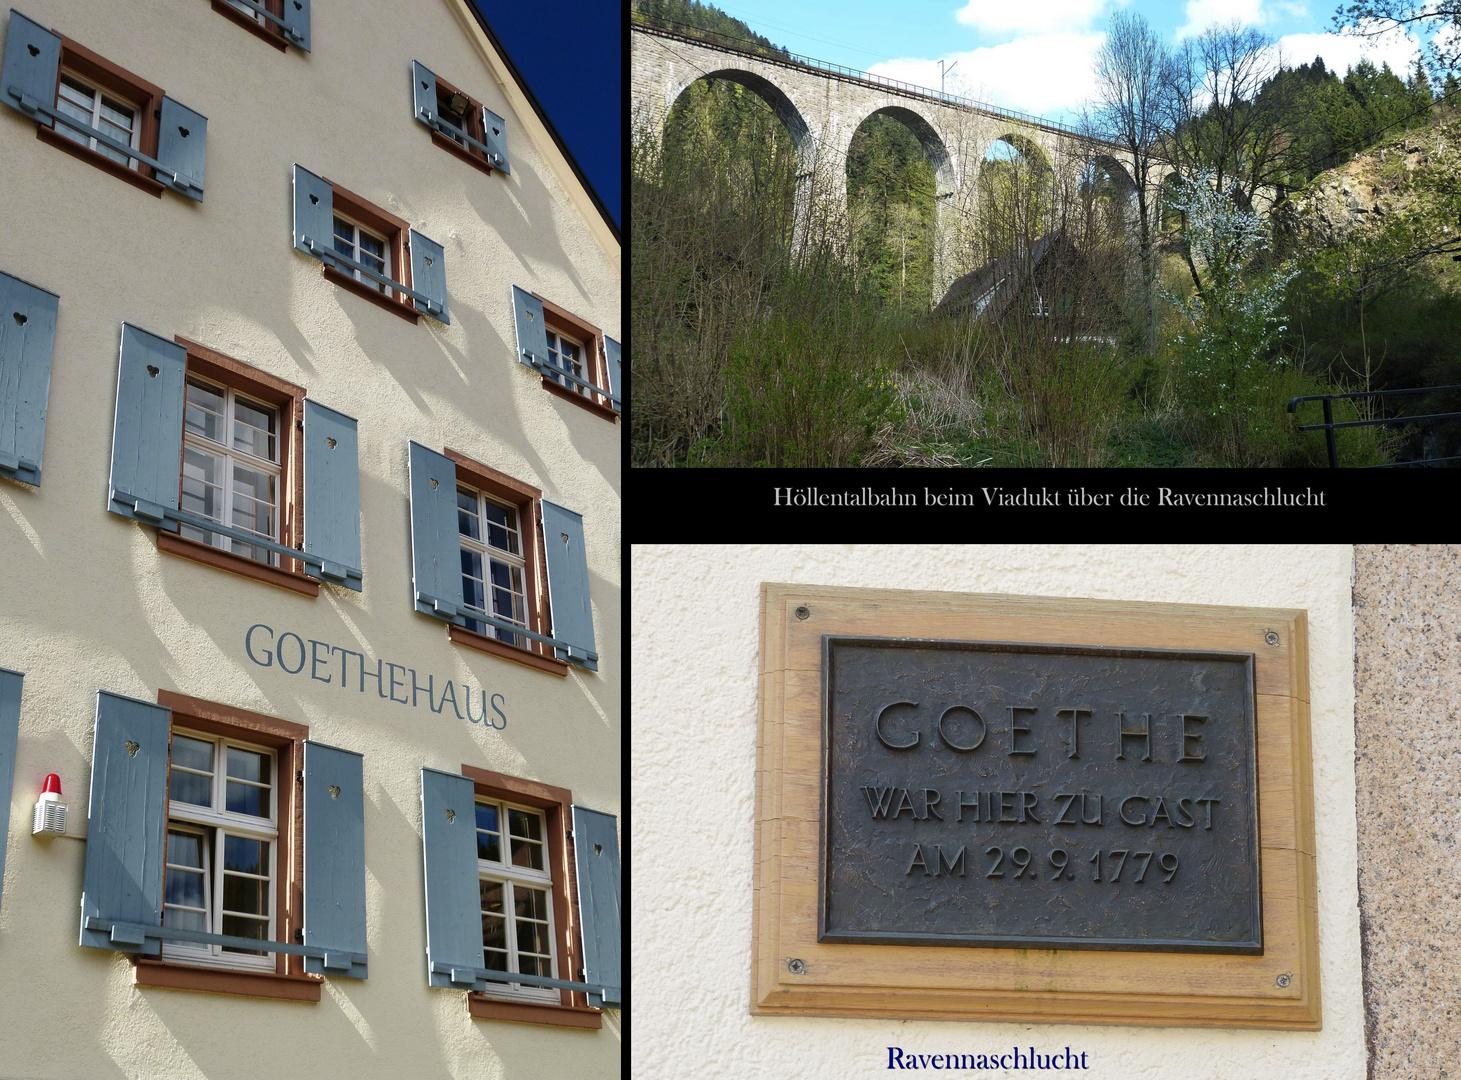 Goethe...